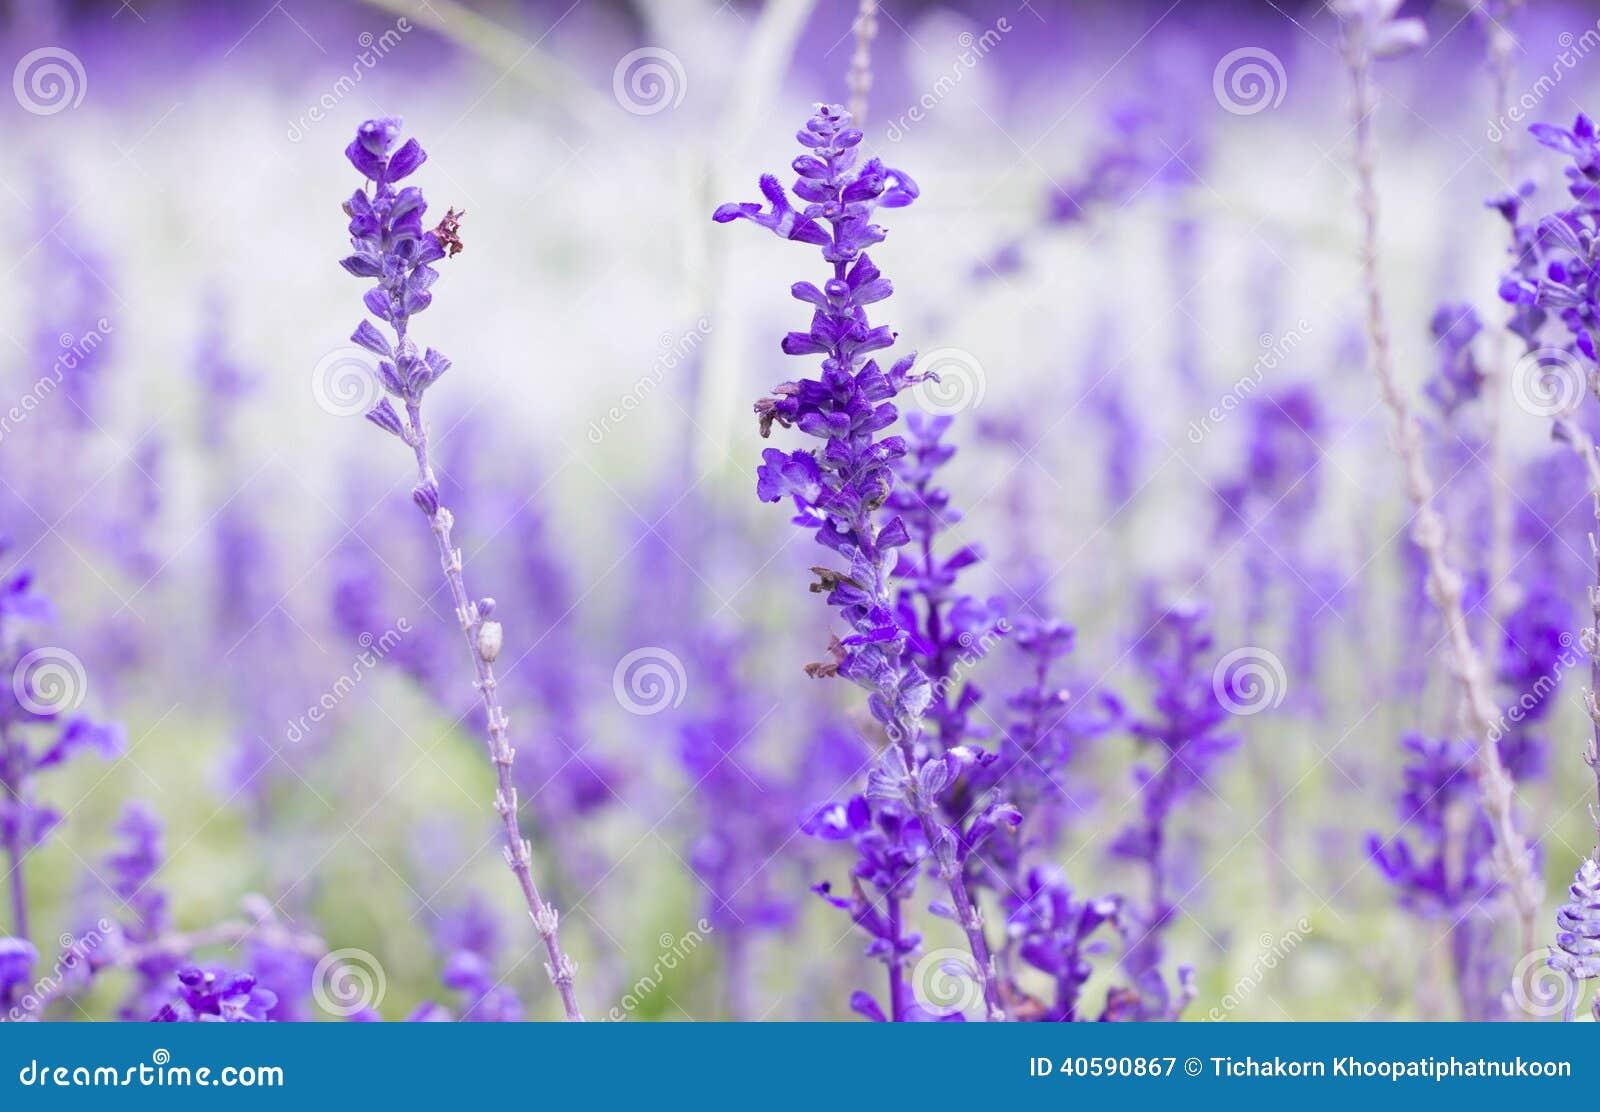 Фиолетовый цветок лаванд